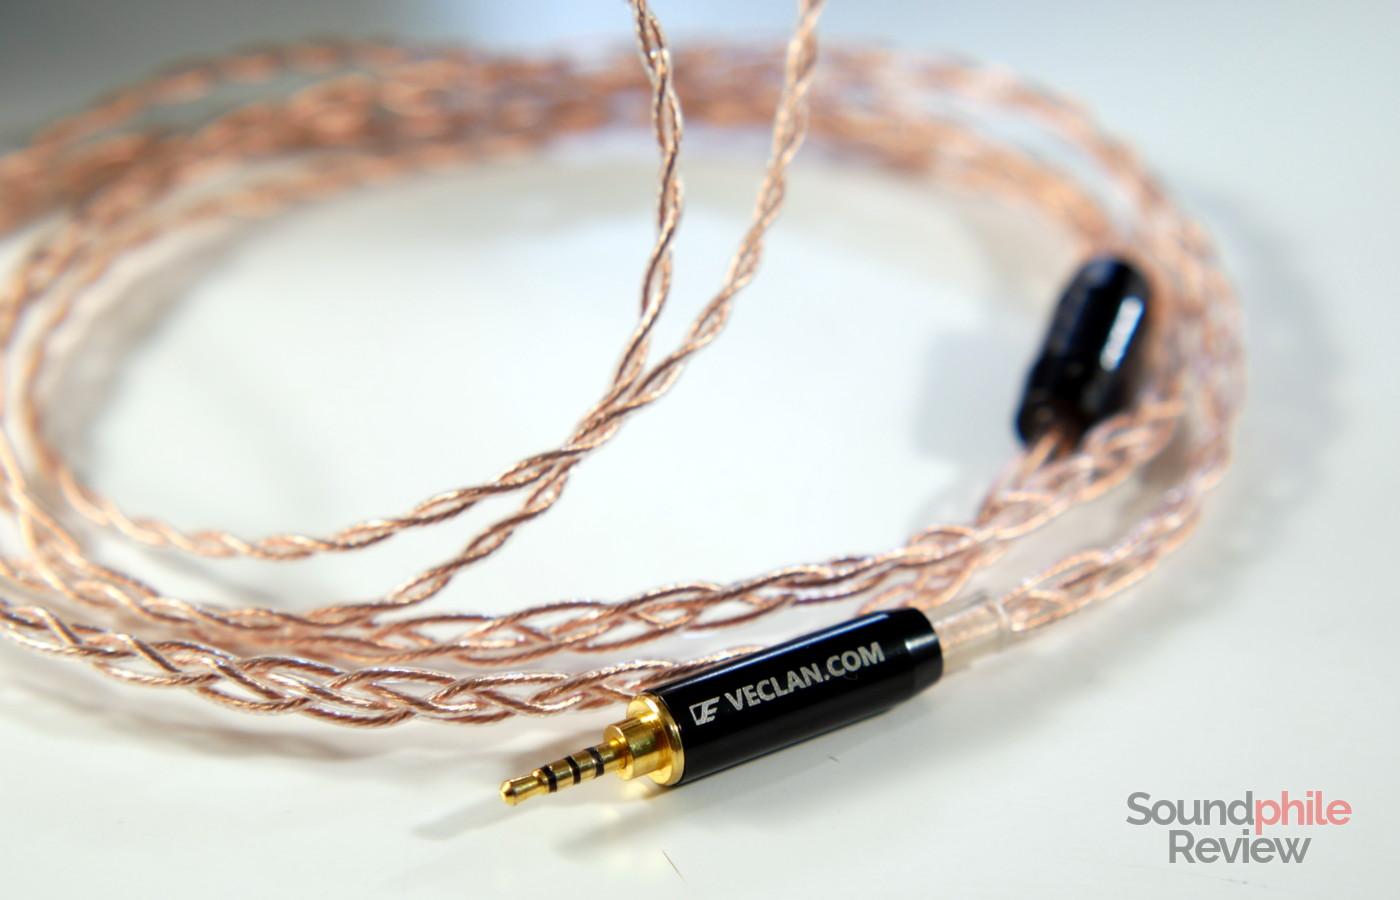 Venture Electronics Standard DI Copper Cable